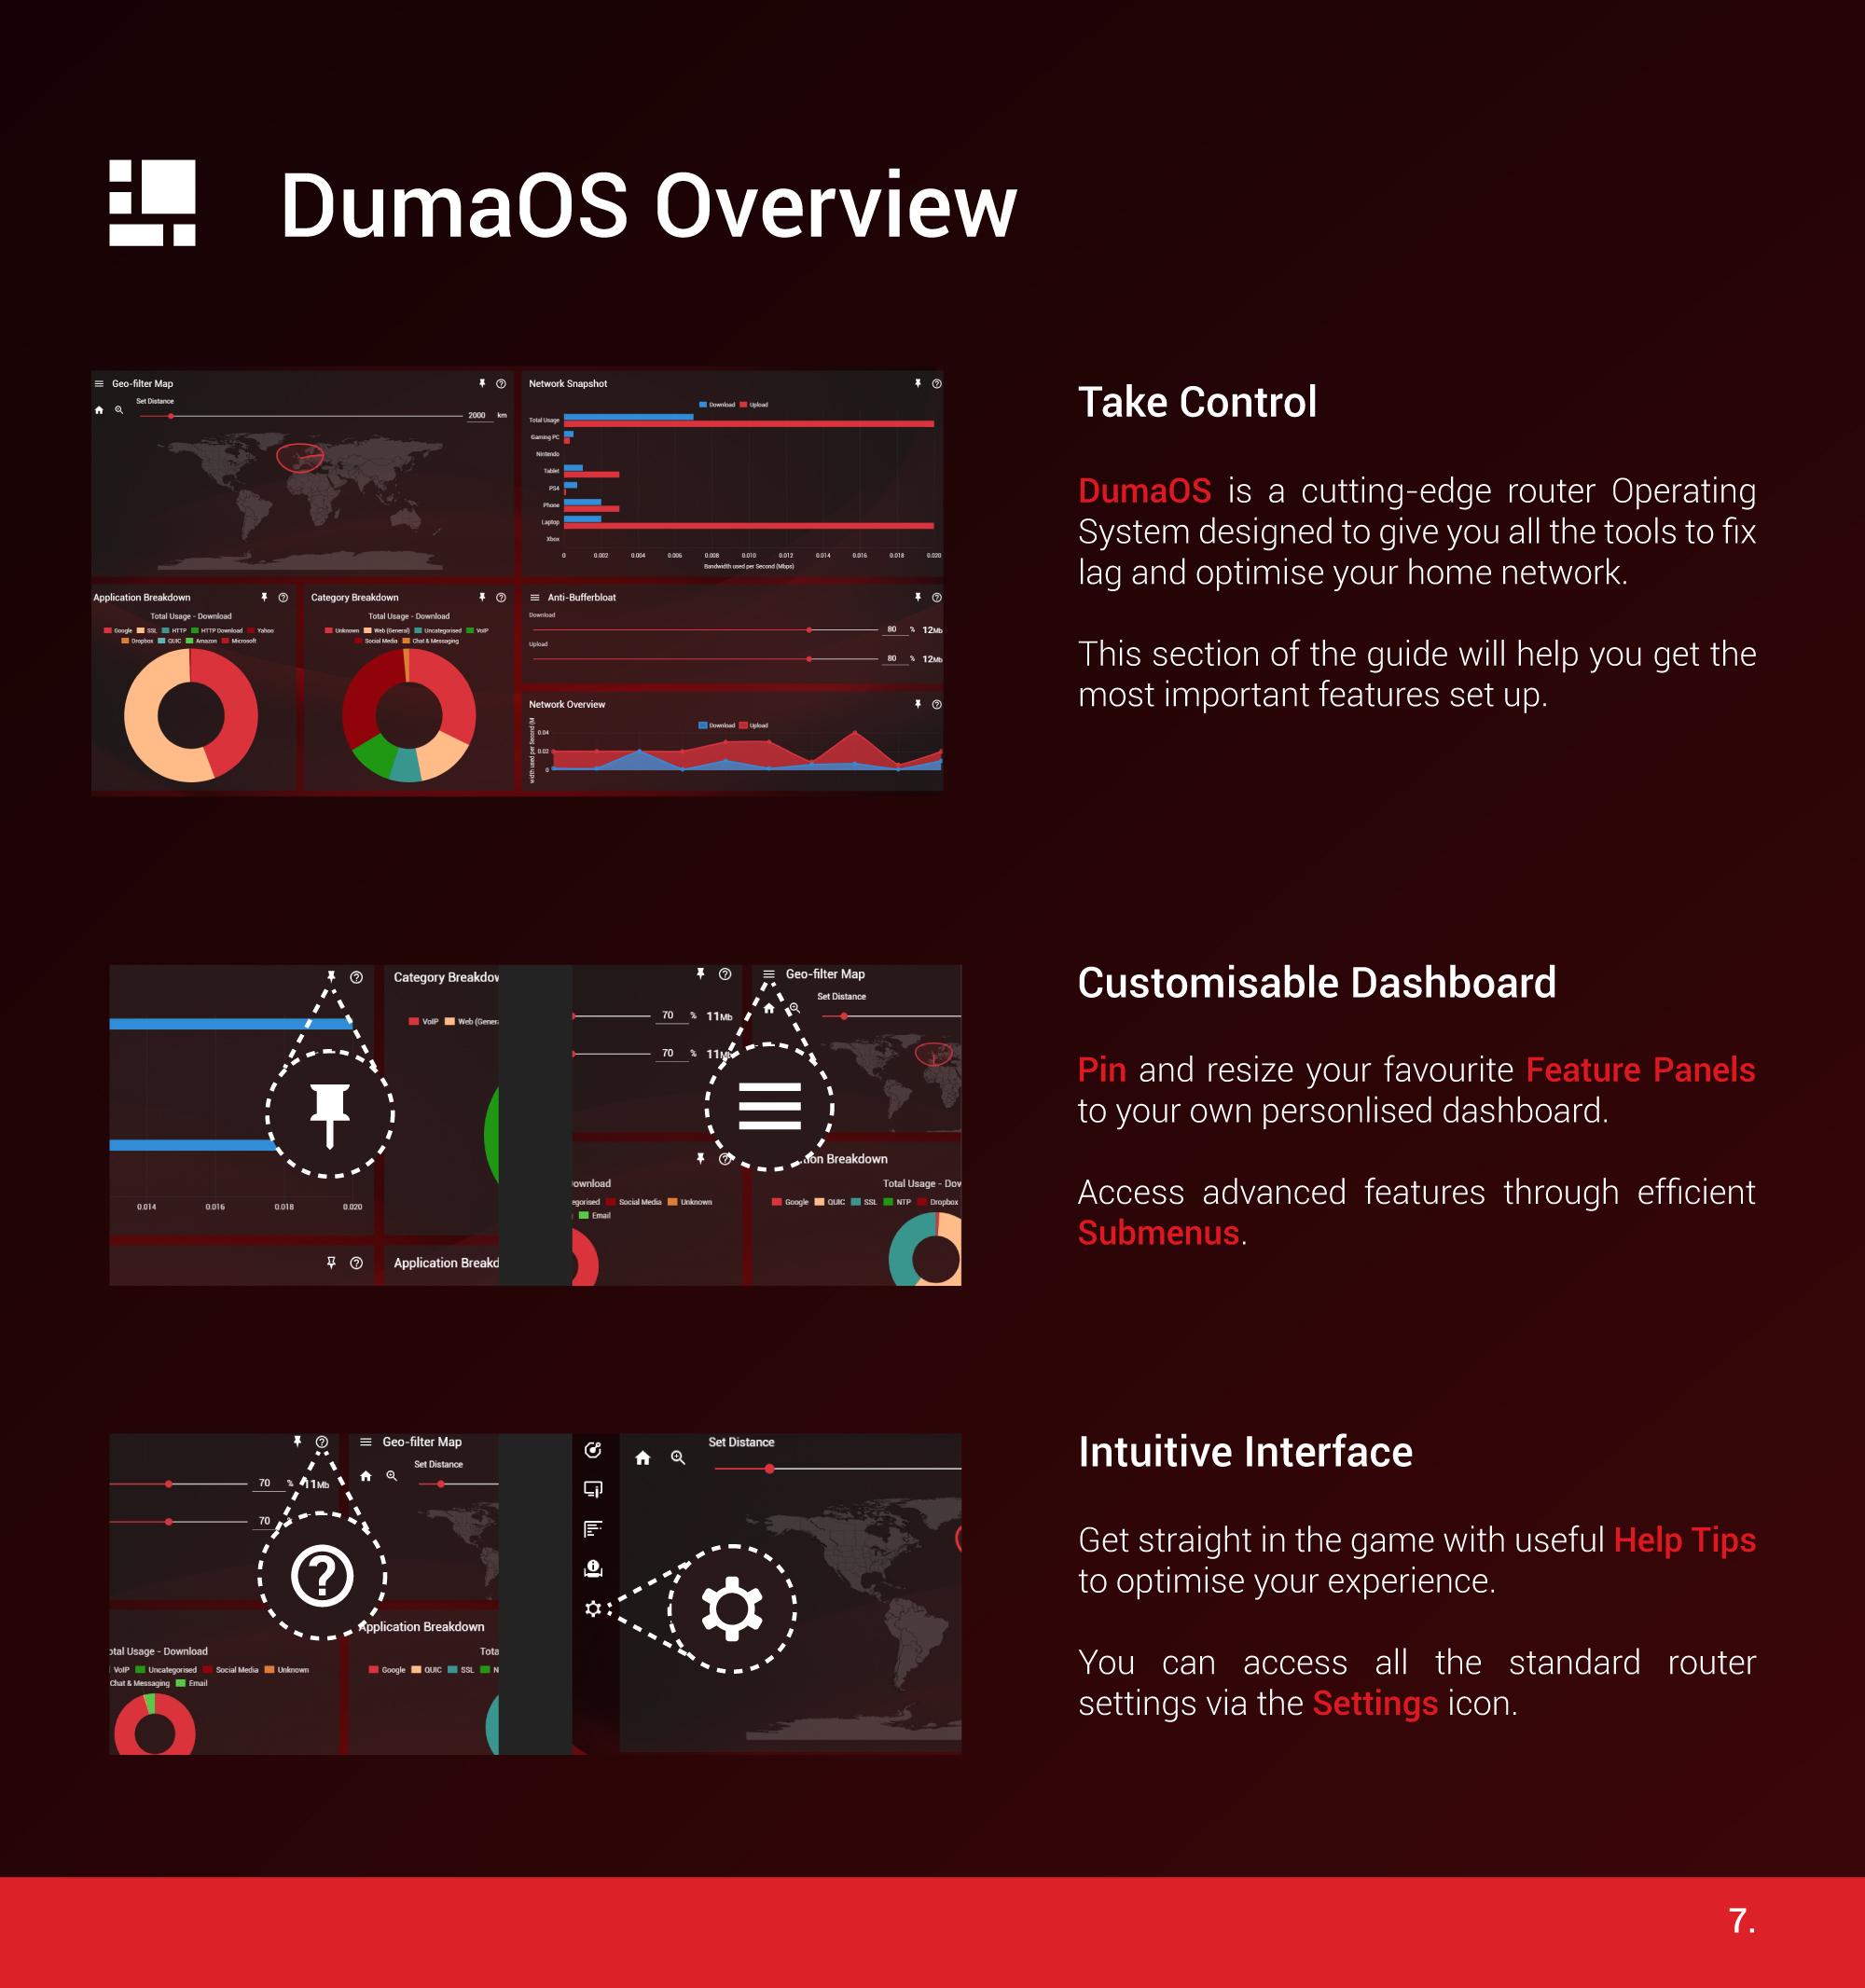 DumaOS Update - Recent Progress - Page 3 - News & Announcements